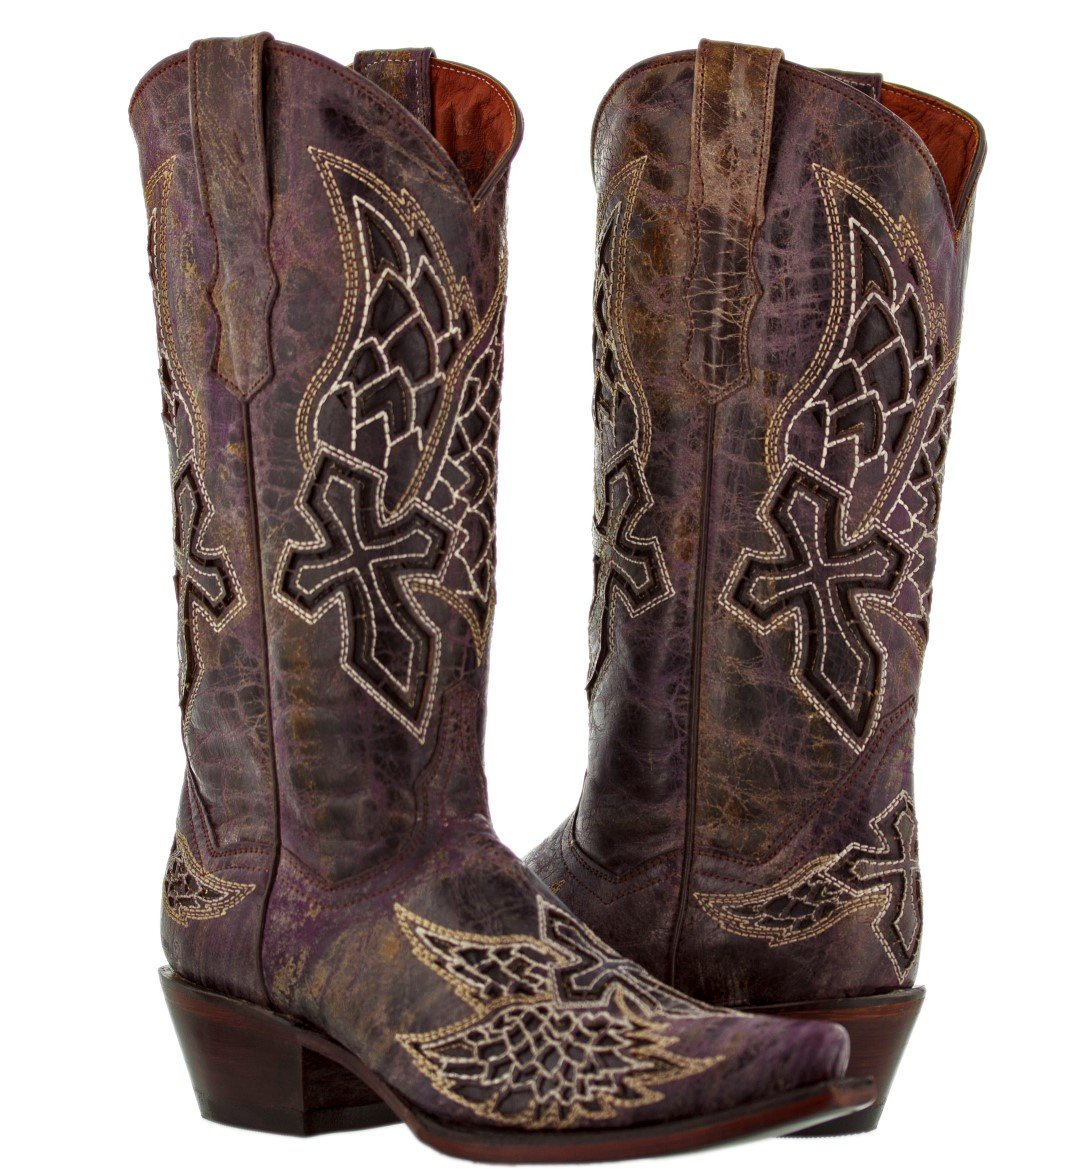 Cowboy Professional Women's Purple Wings & Cross 2 Cowboy Boot Snip Toe 11 BM